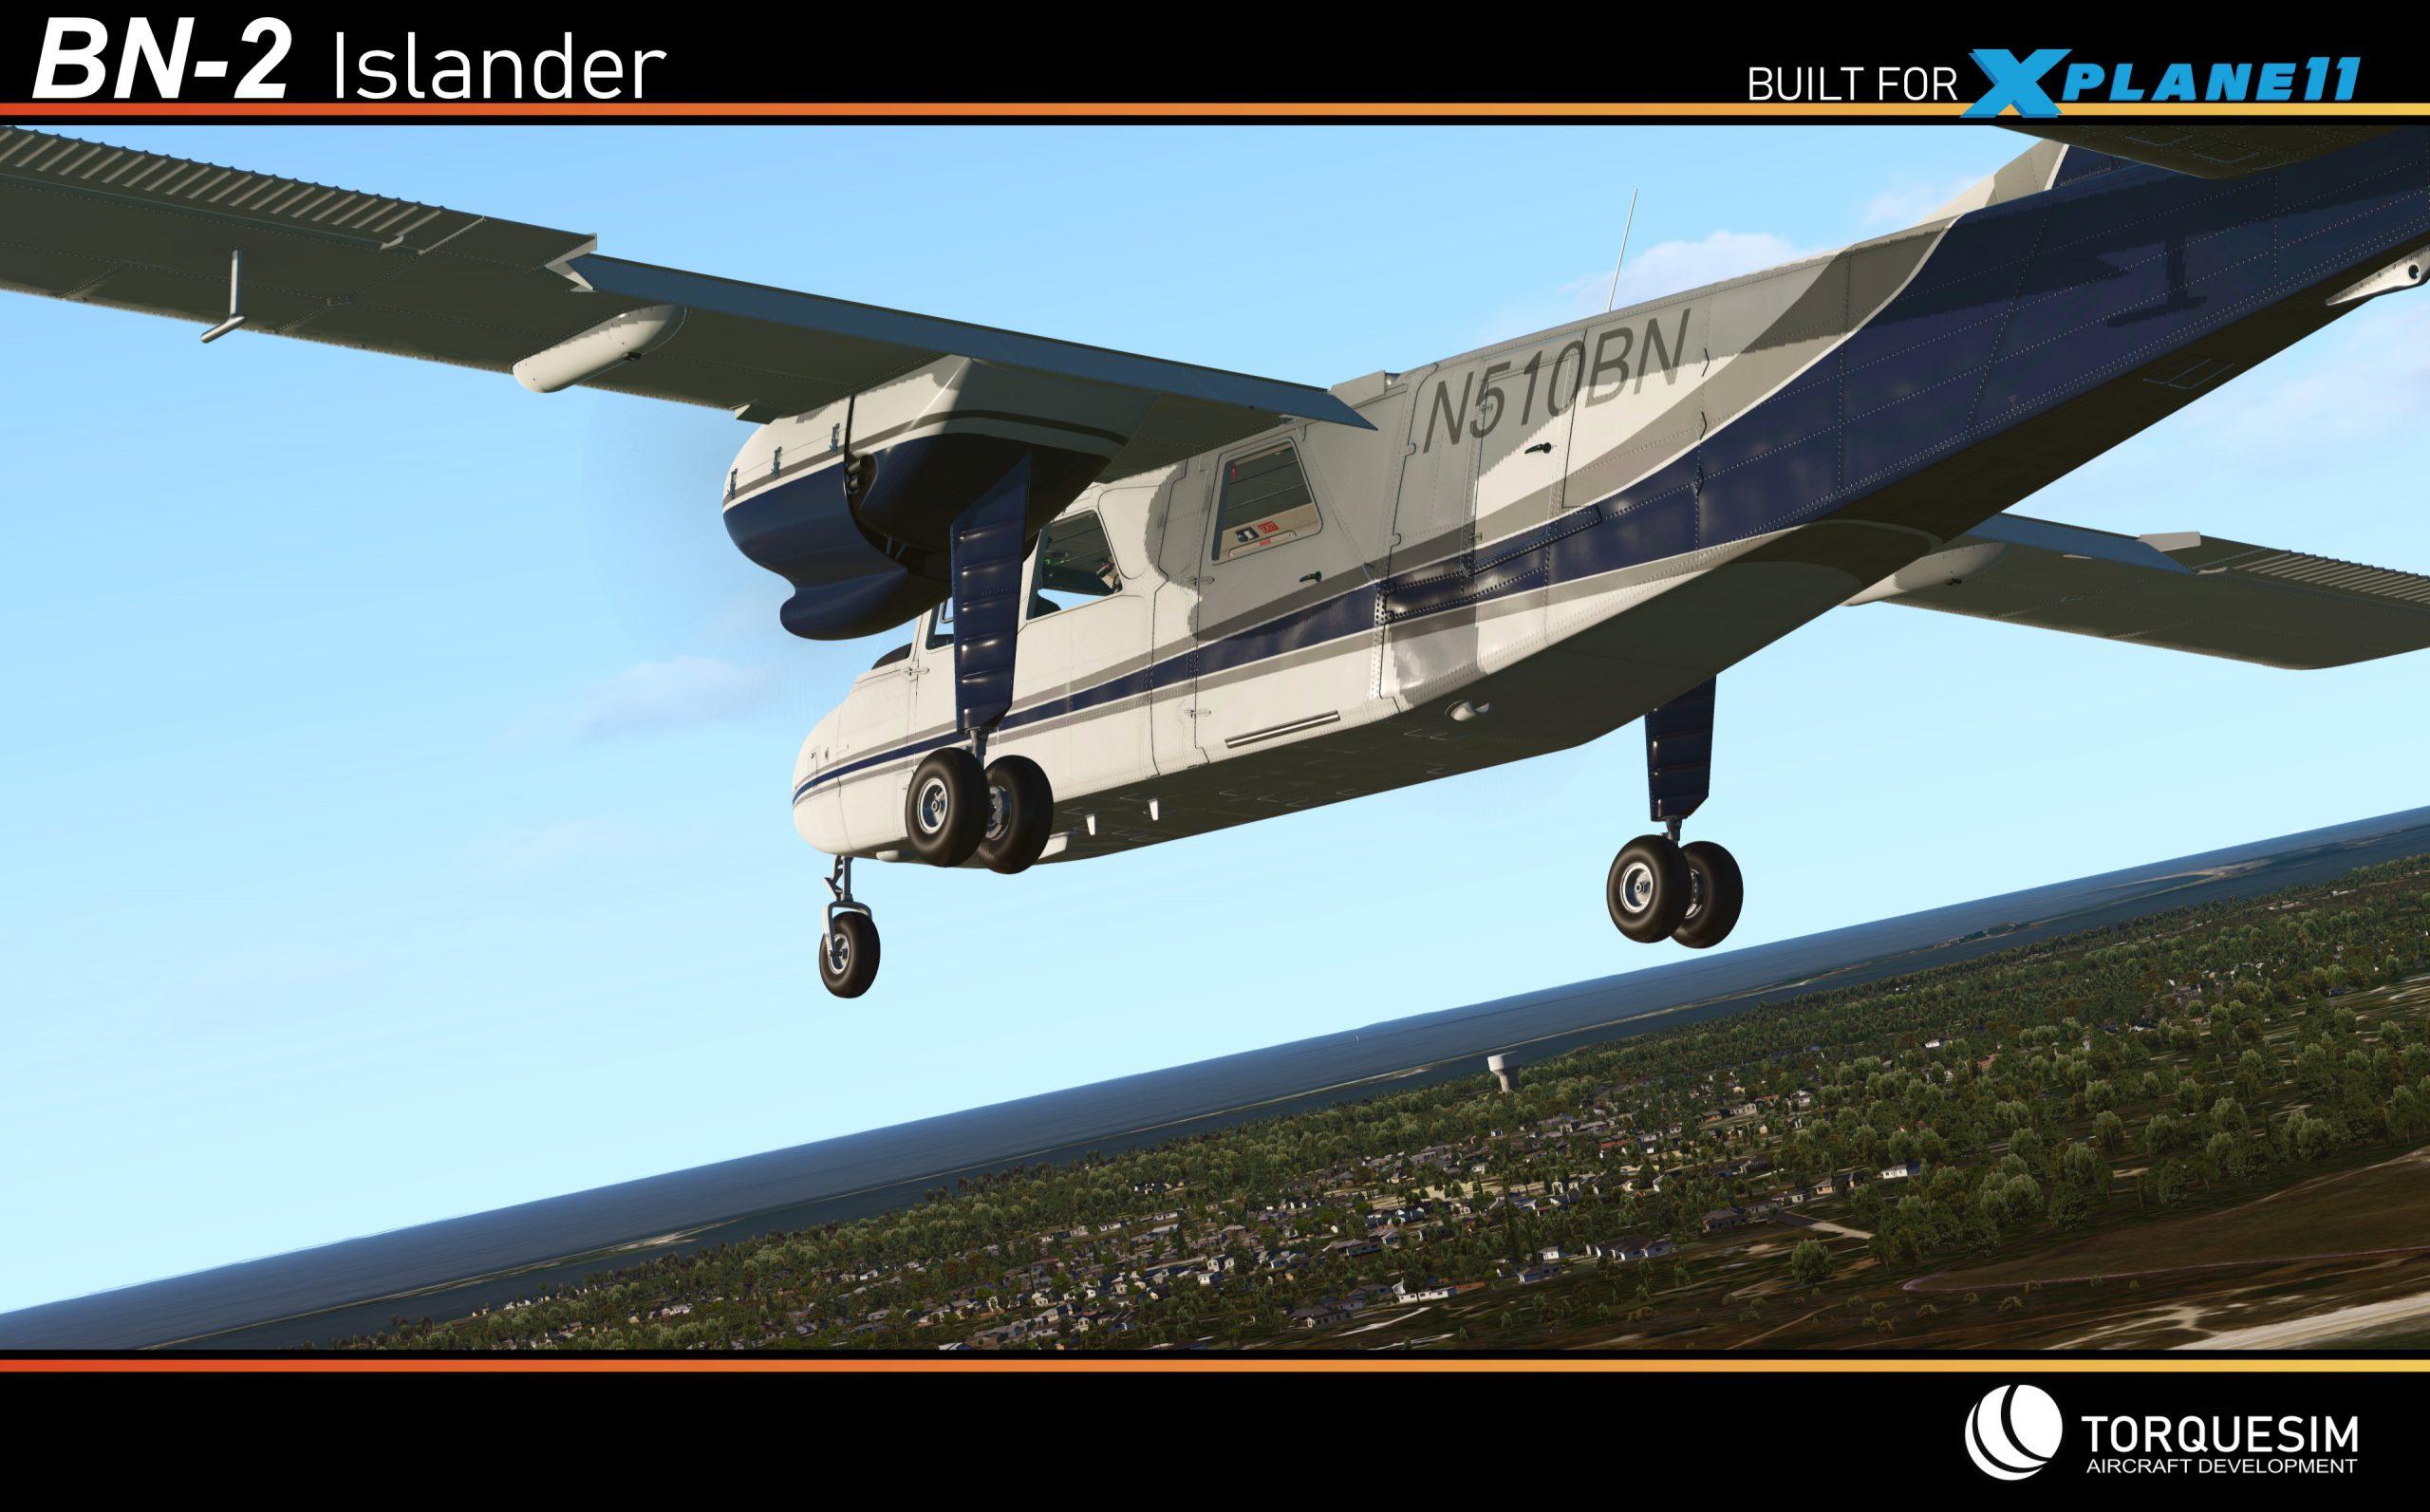 TS-ISL-13Mar-10-scaled Torquesim BN-2 Islander Update 1.1.0 Released